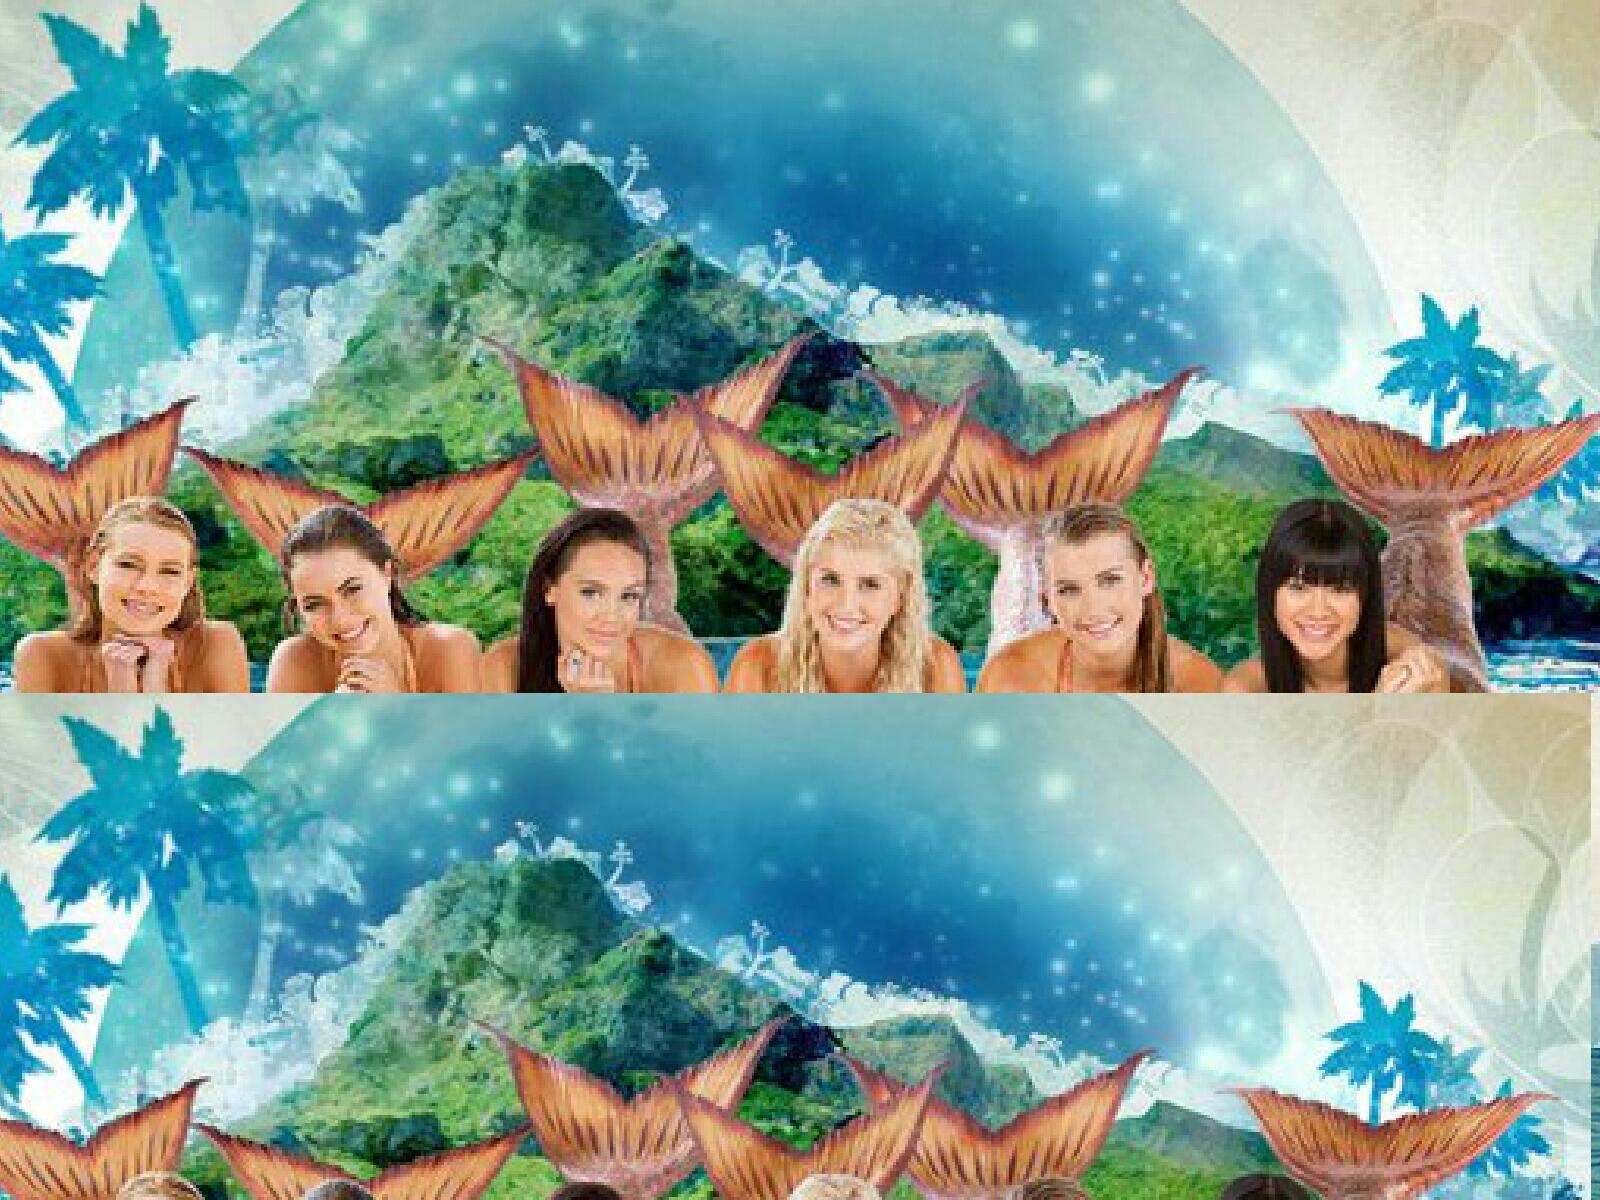 Mako Island Of Secrets Bilder Mako Meerjungfrauen Hd Hintergrund